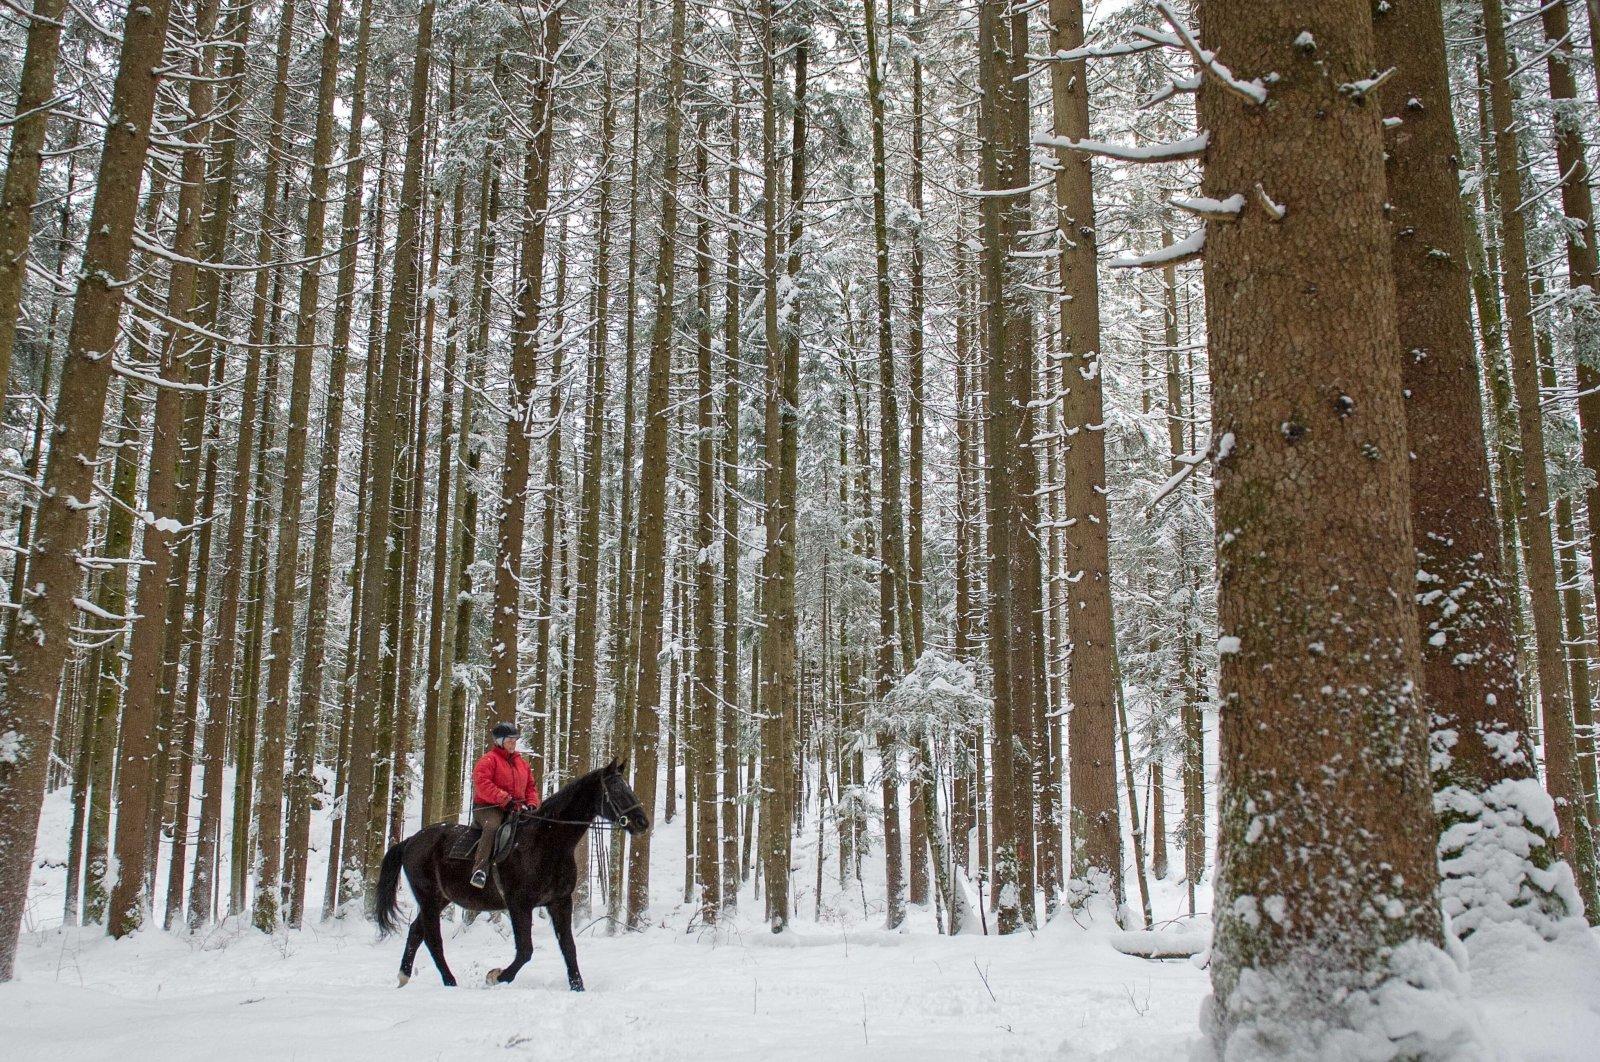 A woman rides with her horse through a forest near Lofer, Austrian province of Salzburg, Feb. 2, 2015. (AP Photo)